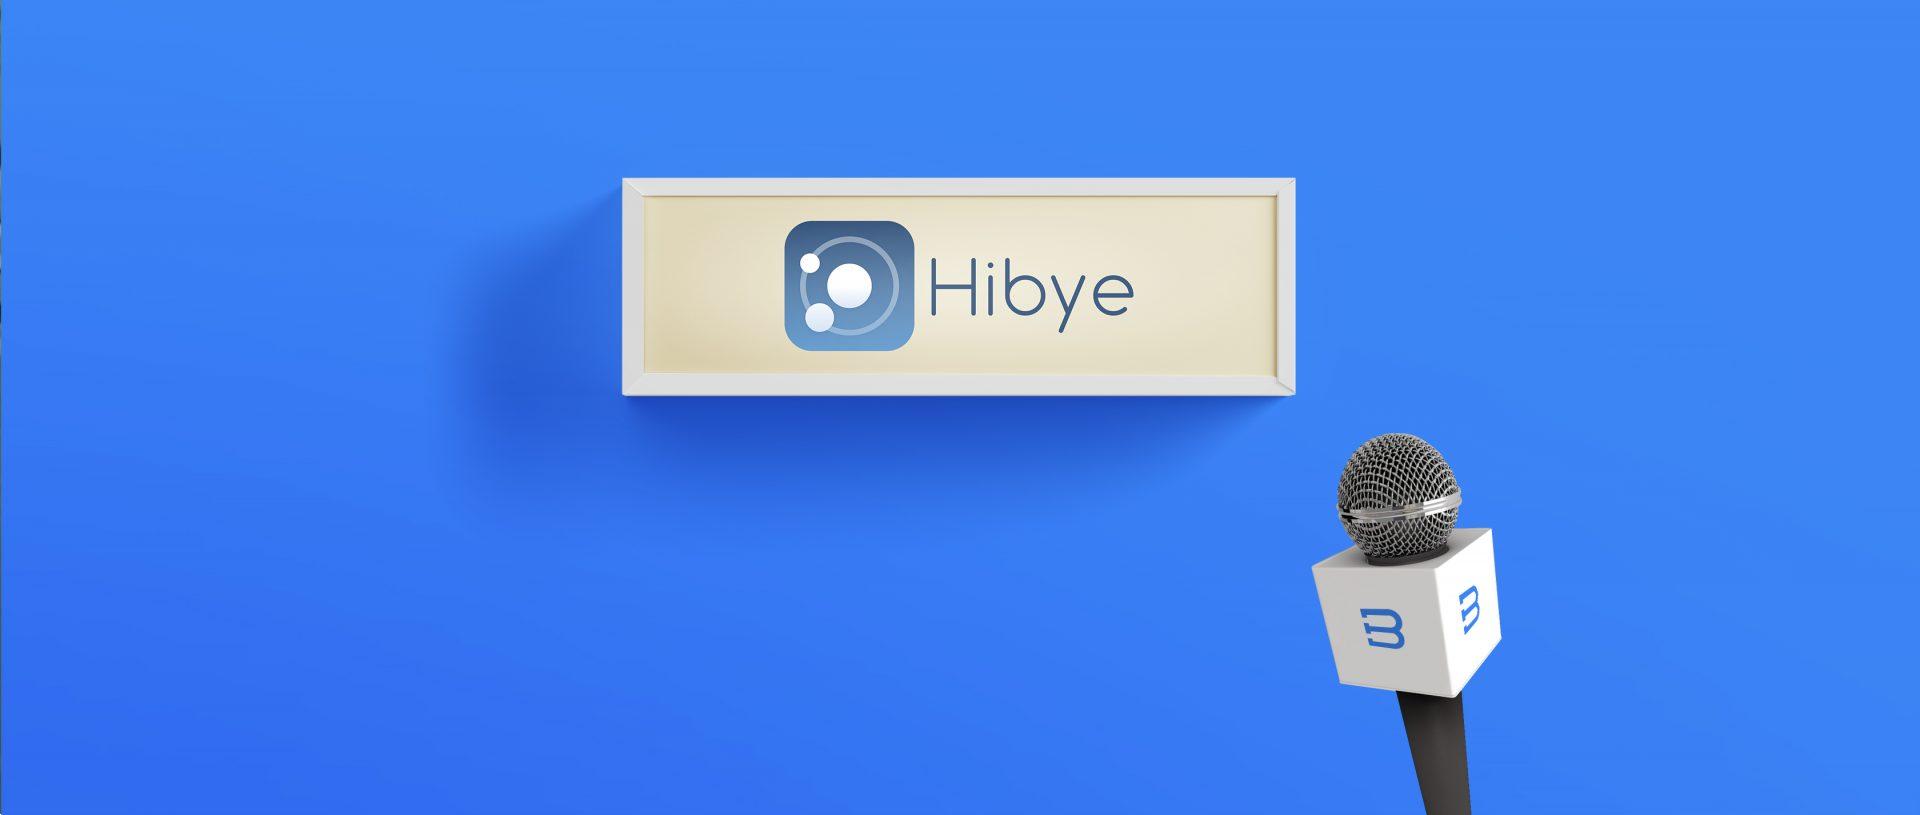 Hybye intervista buytron